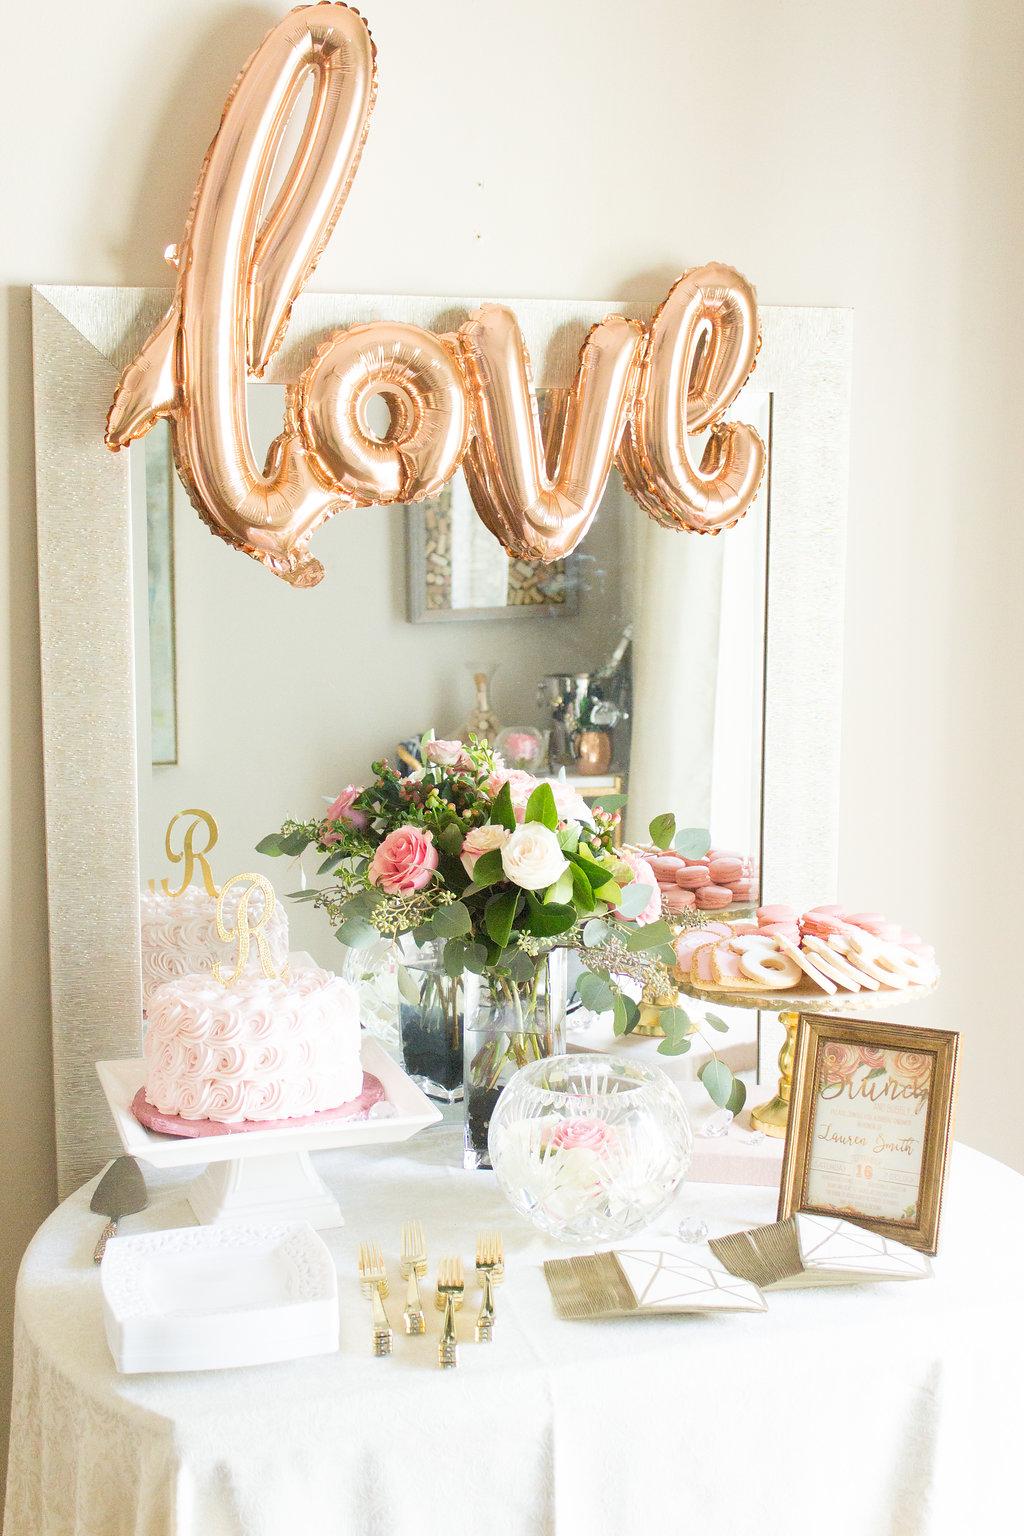 My Bridal Shower  LifetoLauren